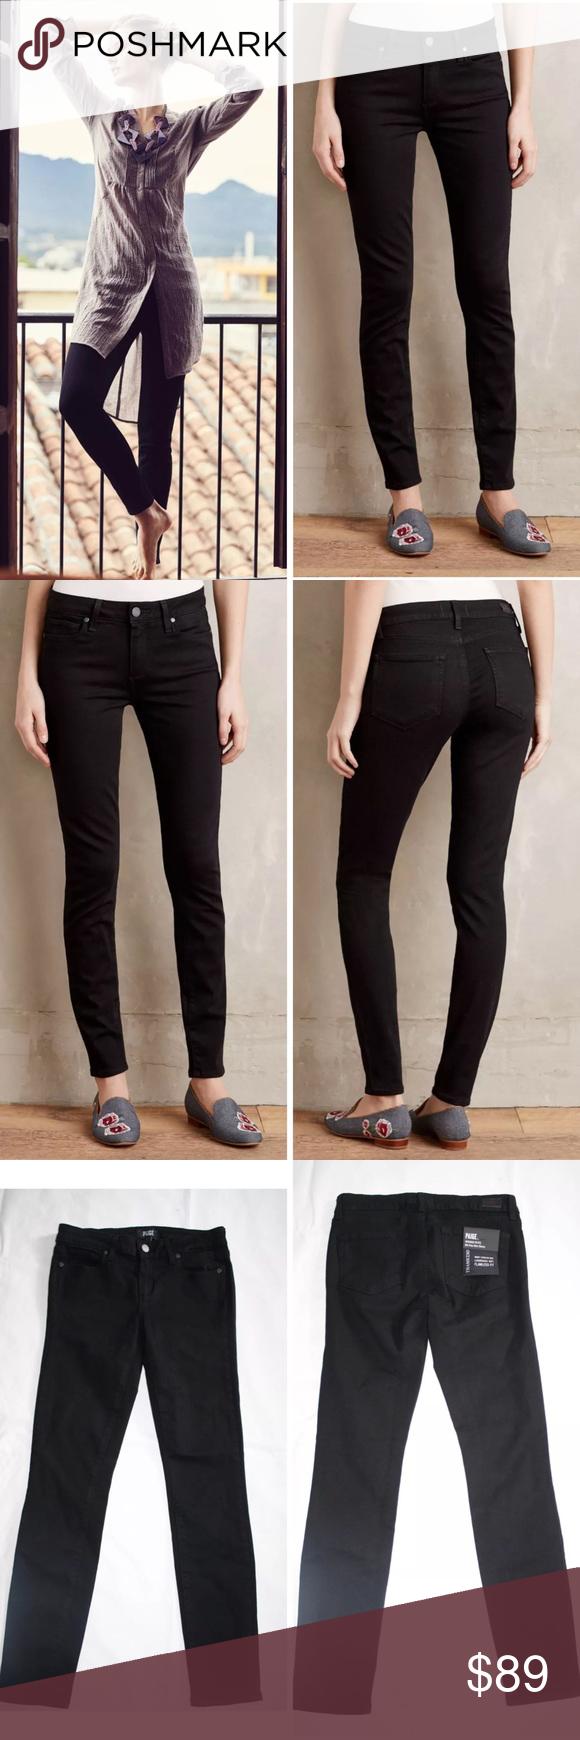 Size 24 petite skinny jeans